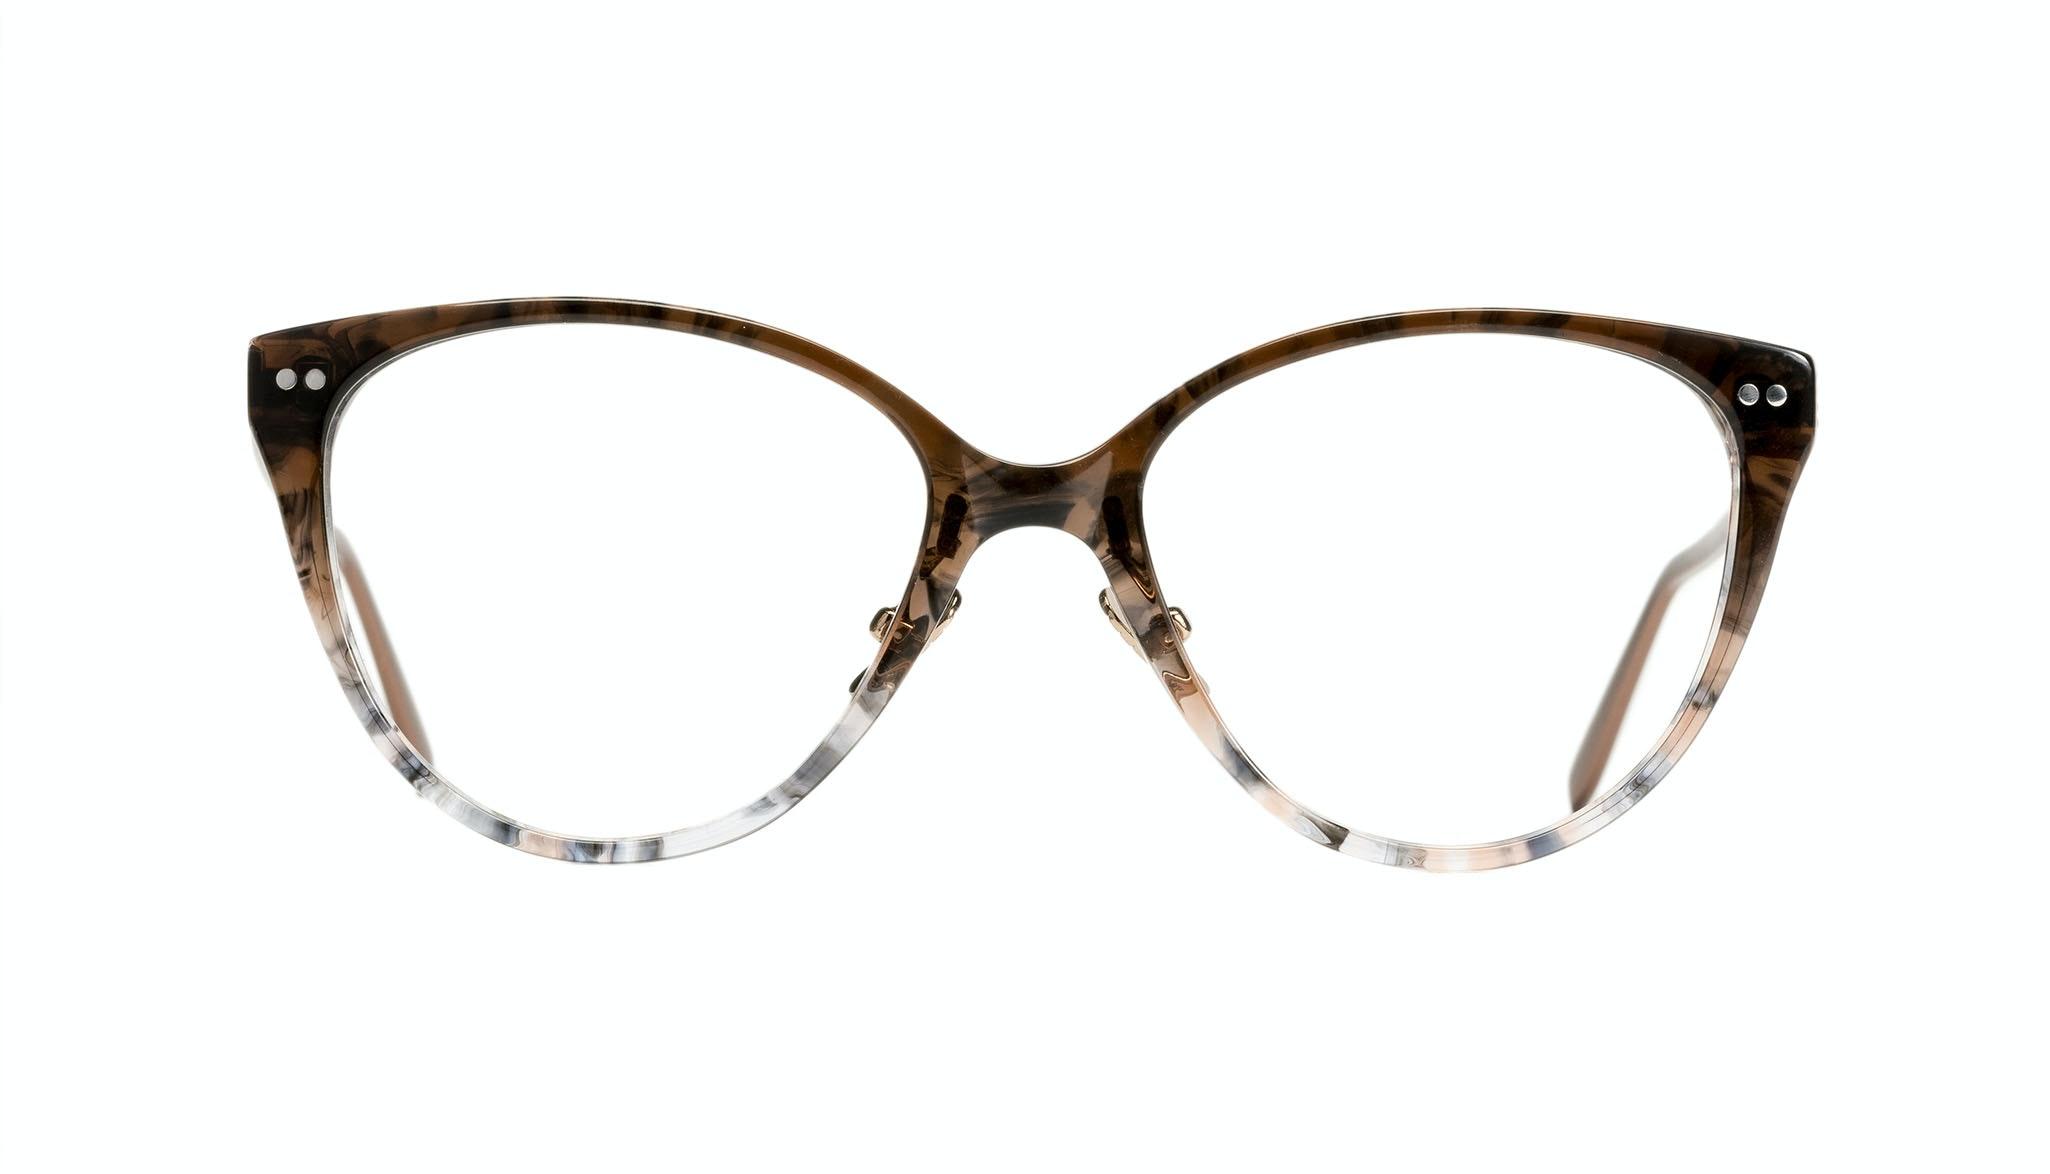 Affordable Fashion Glasses Cat Eye Eyeglasses Women Hope Mood Dust